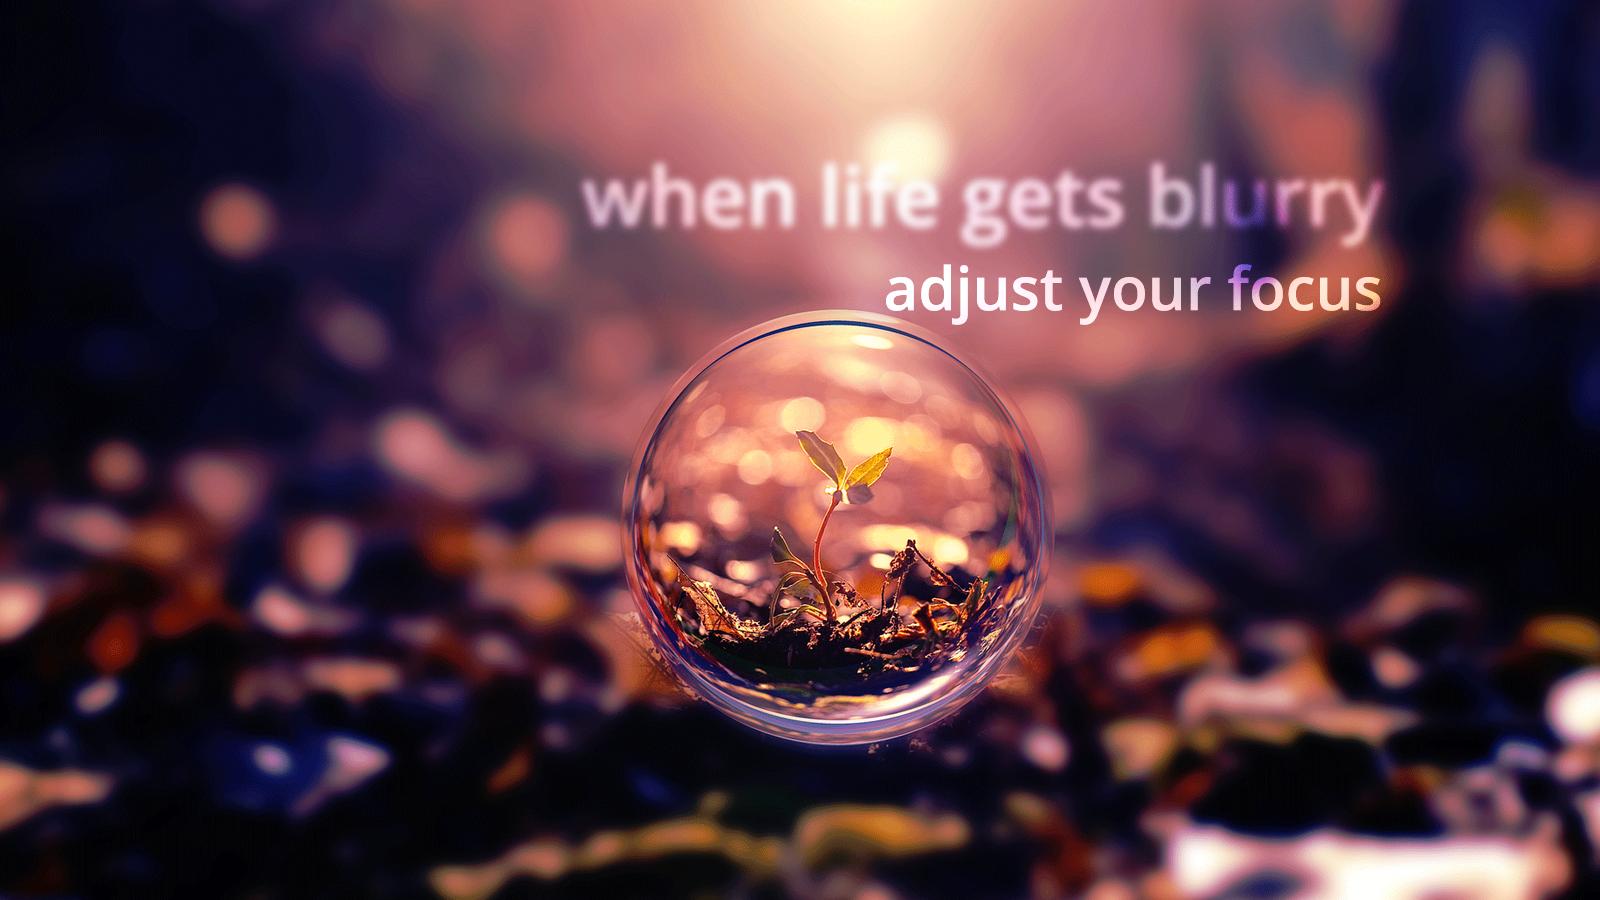 When Life Gets Blurry Adjust Your Focus Focus Life Blurry Adjust Wallpaper Desktop Modified Akilva Photography Wallpaper Bubbles Wallpaper Hd Wallpaper